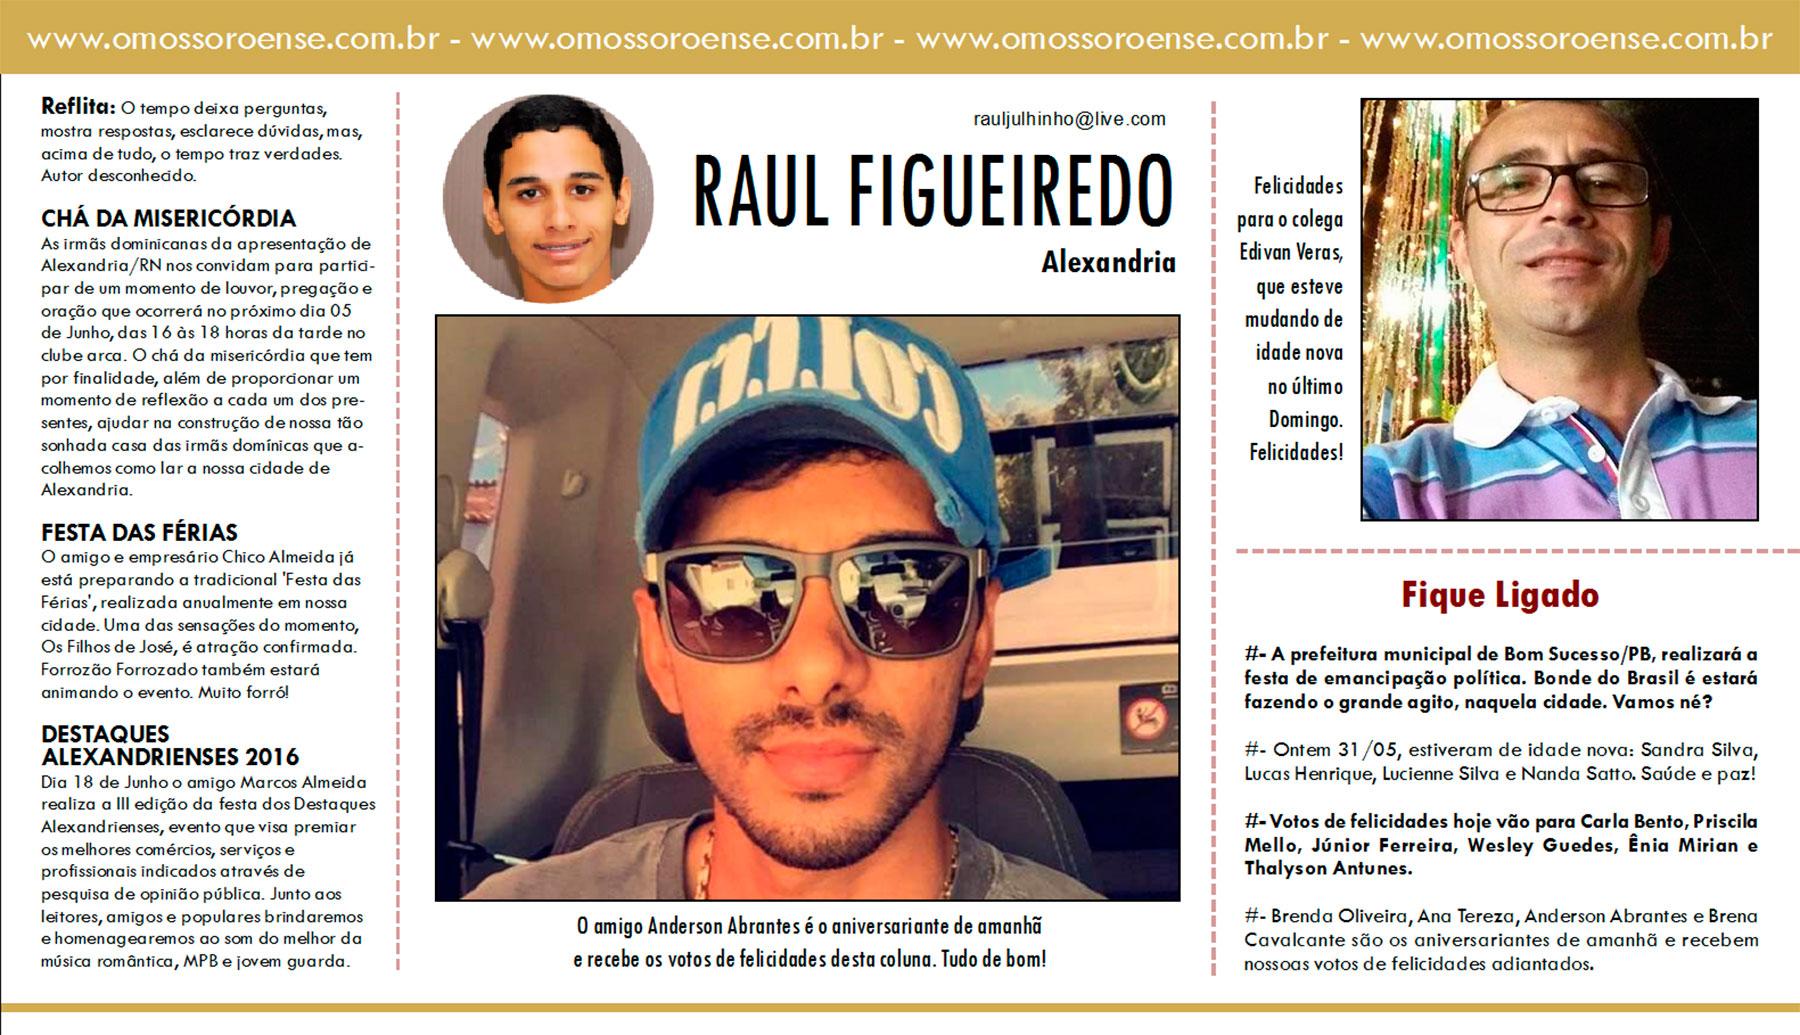 RAUL-FIGUEIREDO---31-05-2016